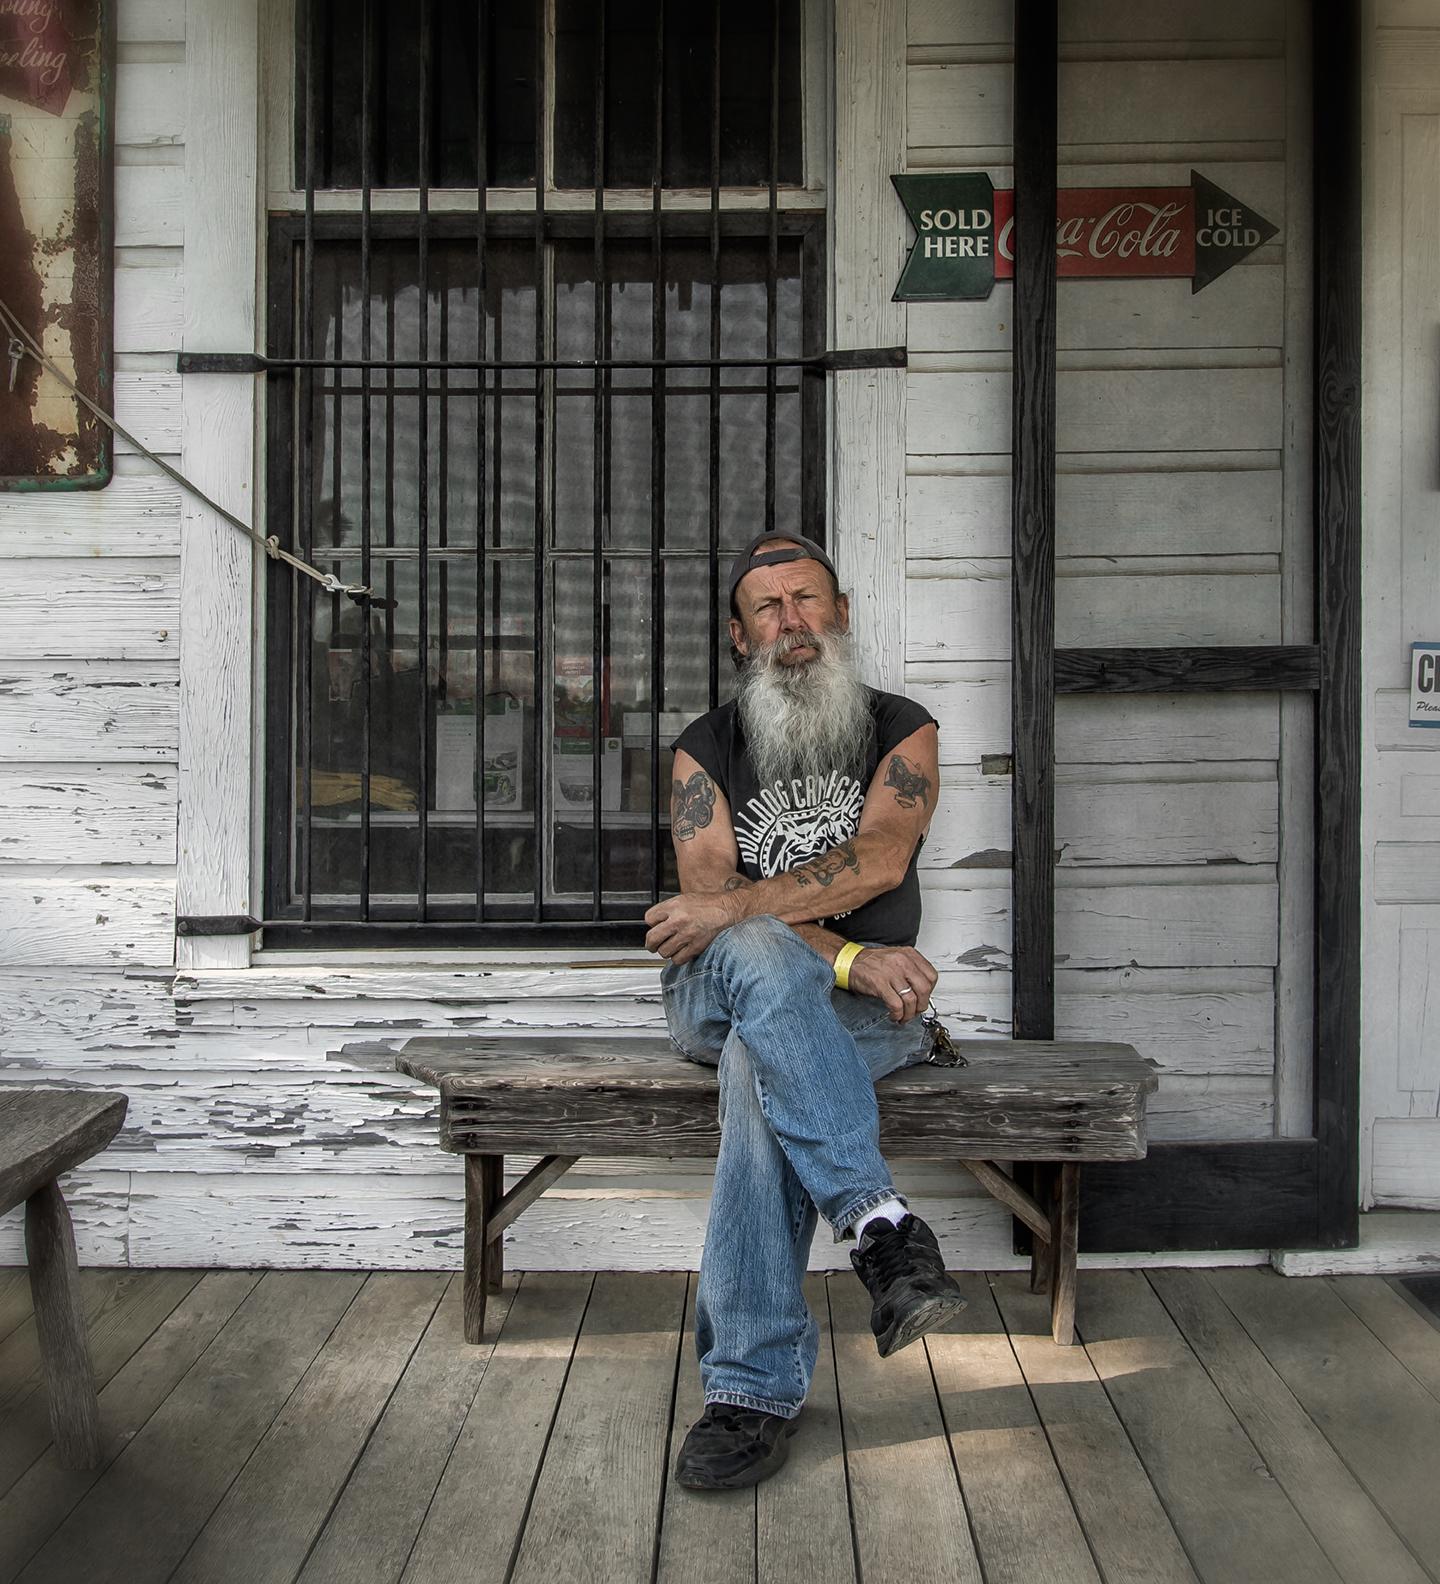 denton_man on porch